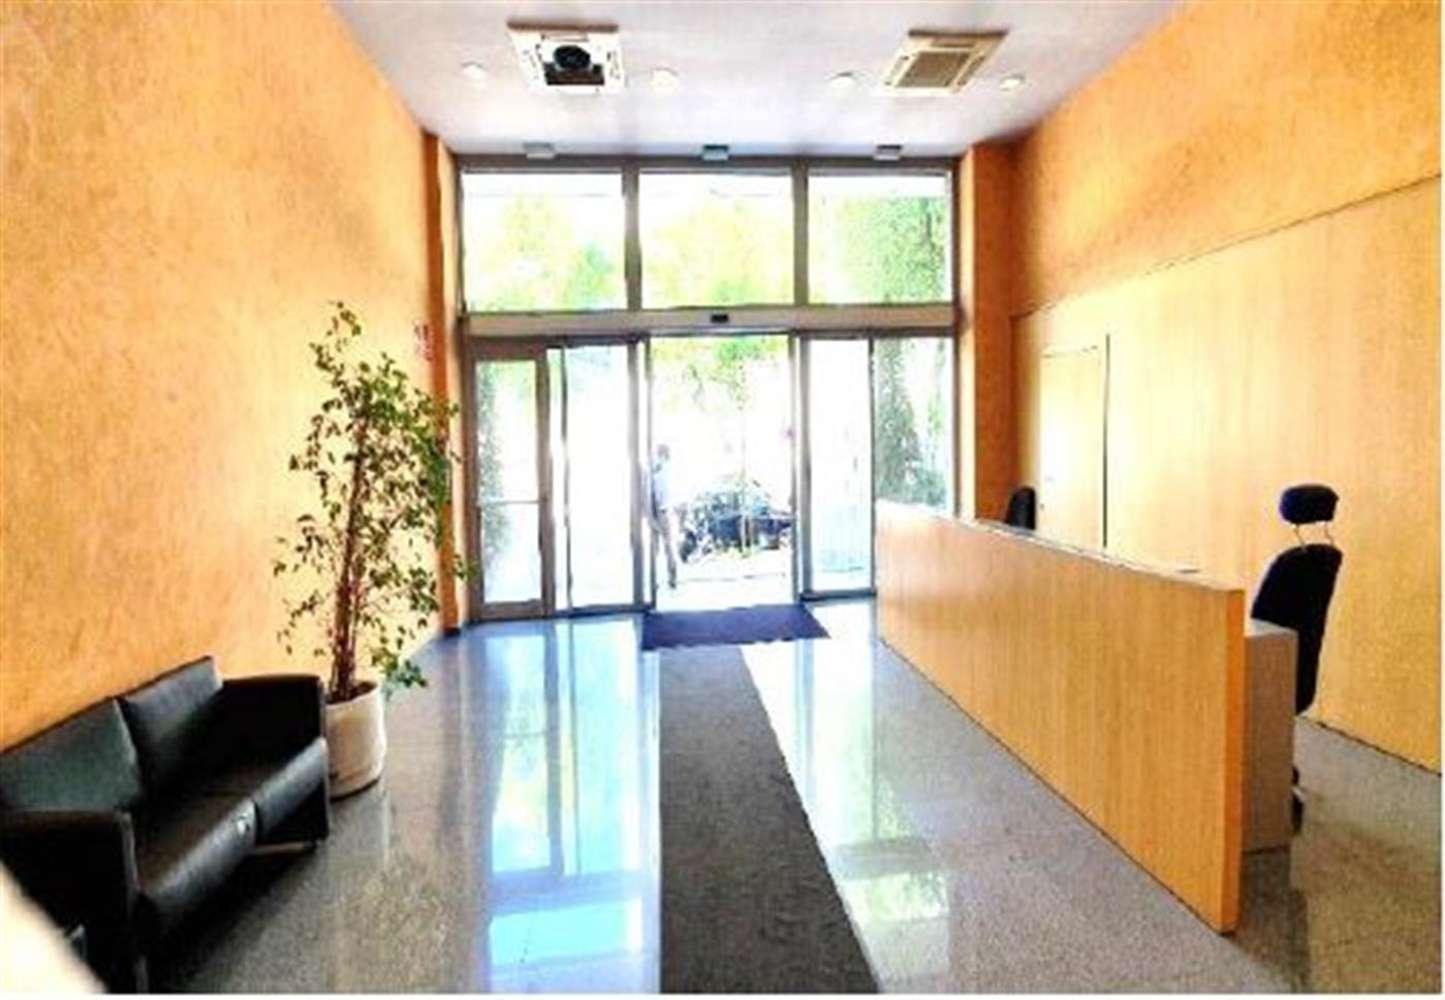 Oficina Barcelona, 08038 - EDIFICIO ATO